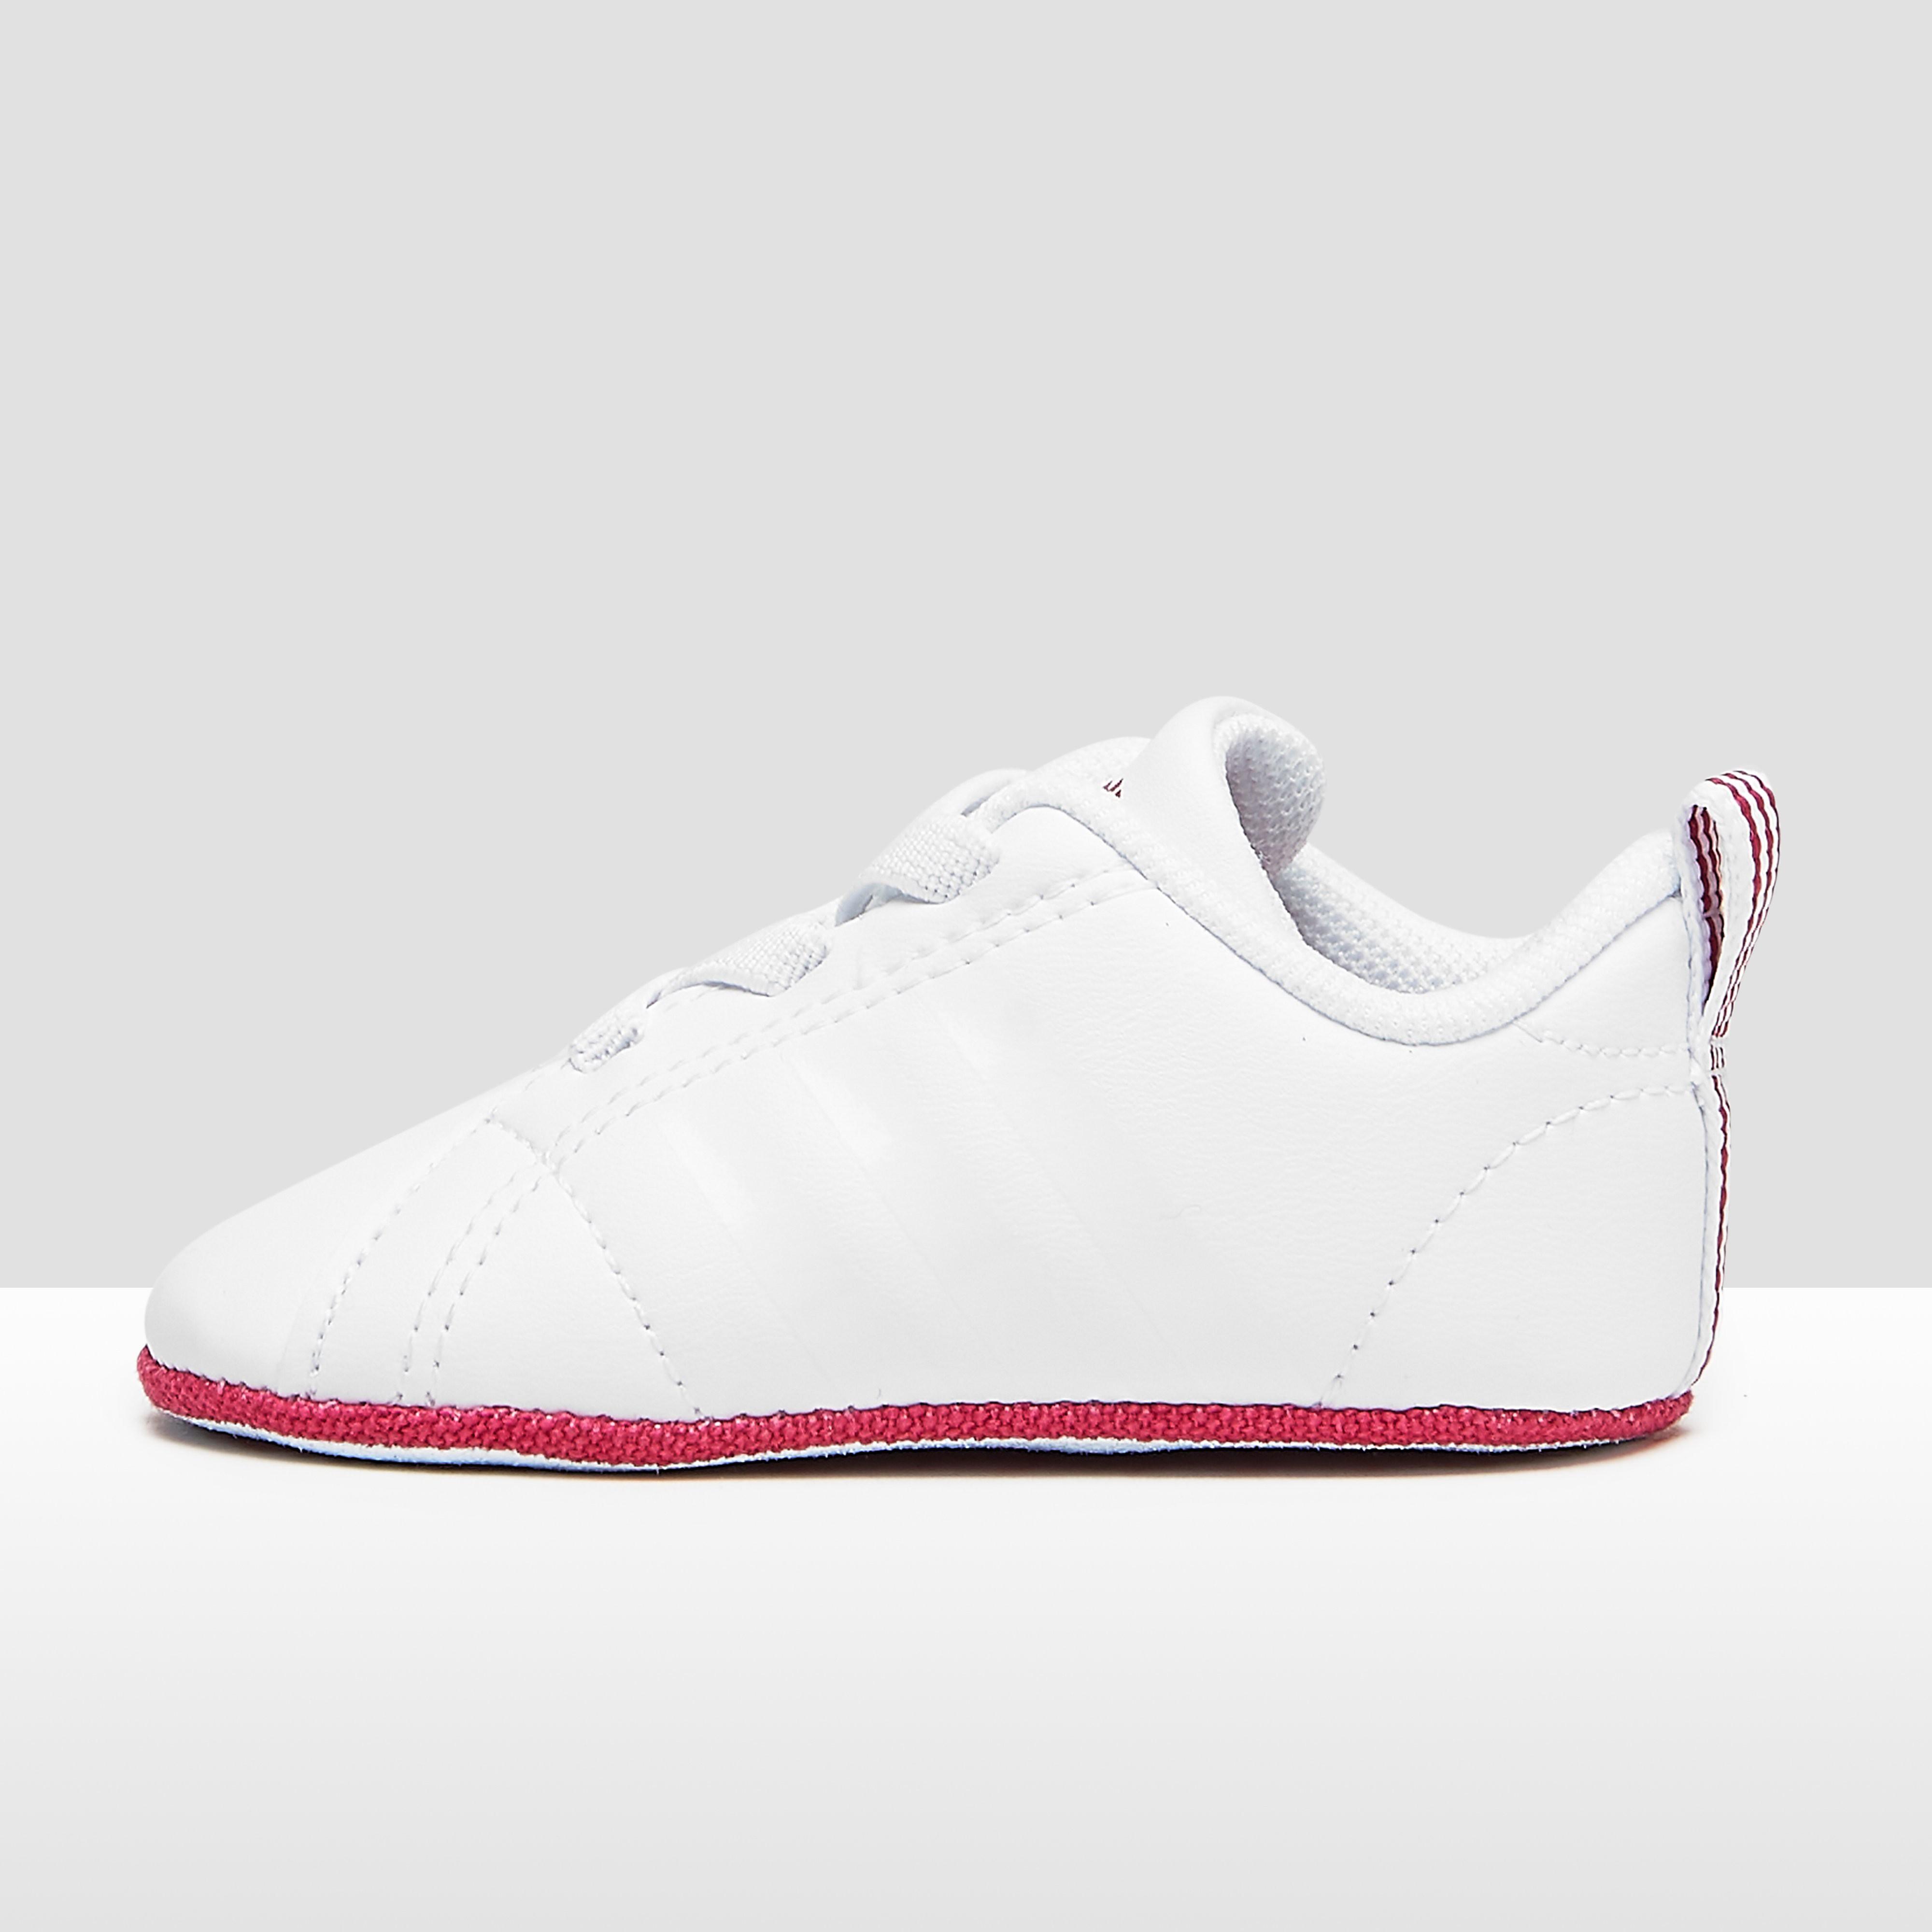 Vs Advantage Crib Sneakers Wit-Roze Baby. Size 17 0